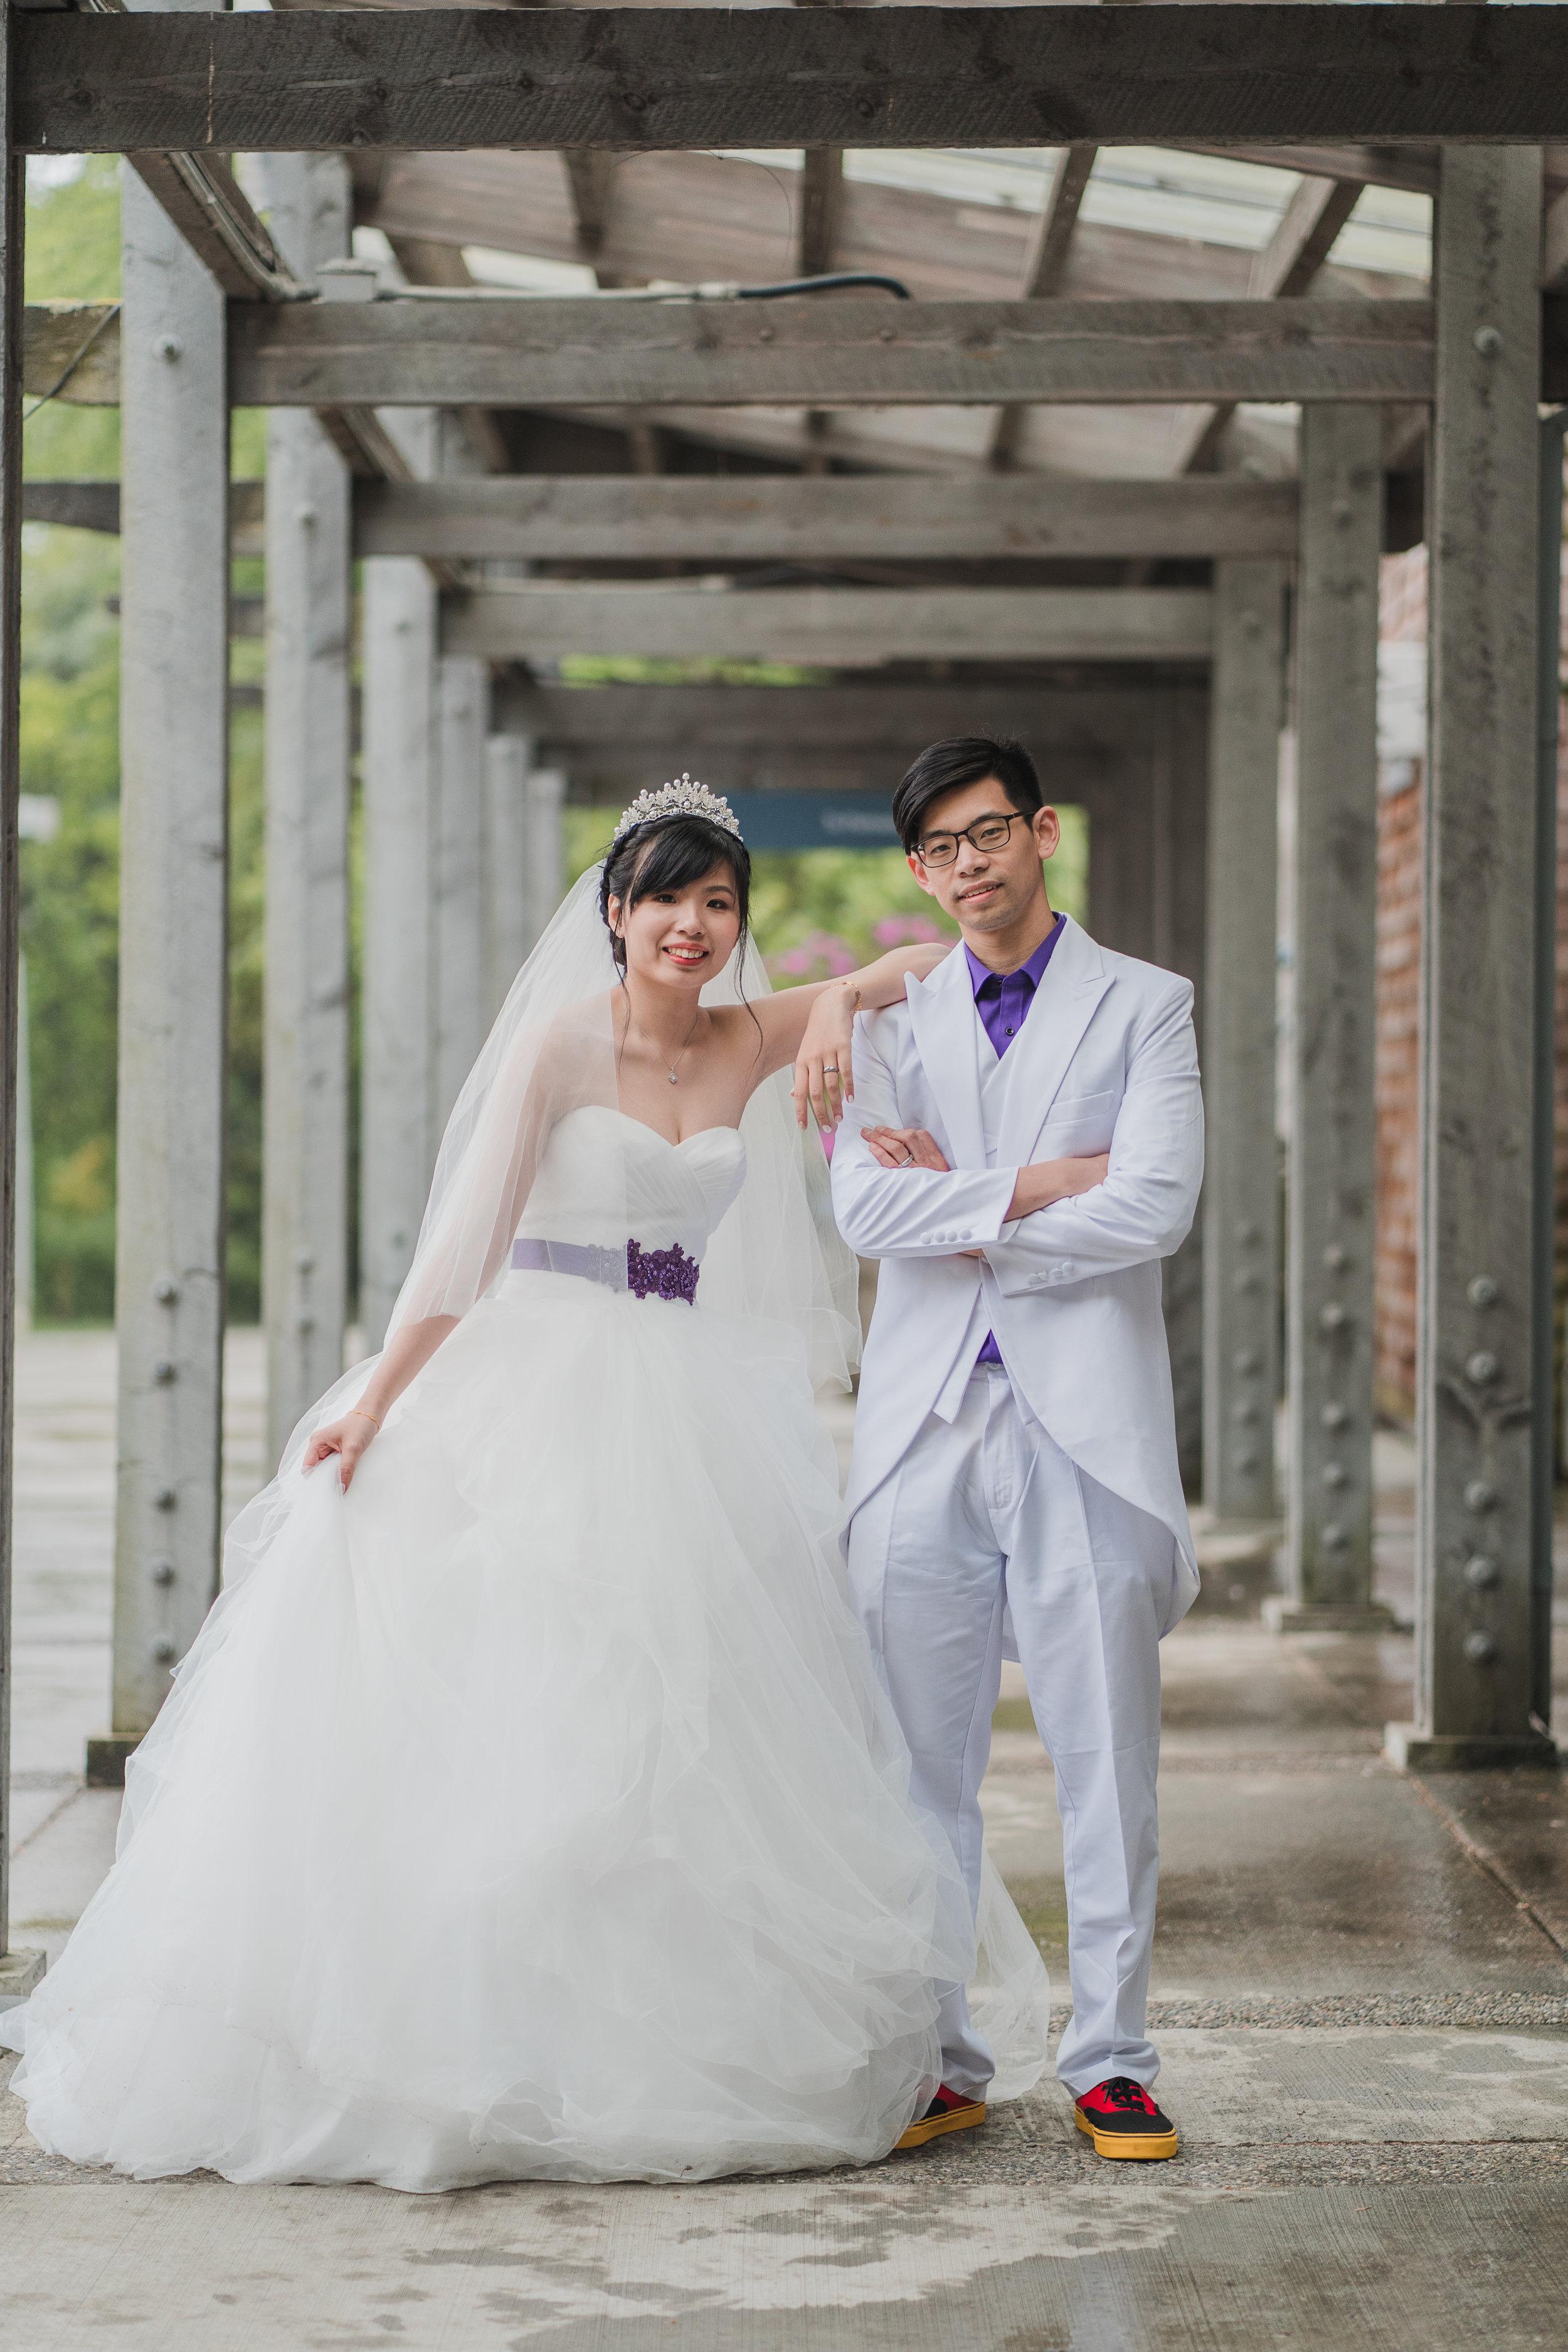 20190520 - Pamela & Matthew Wedding - 0231.jpg